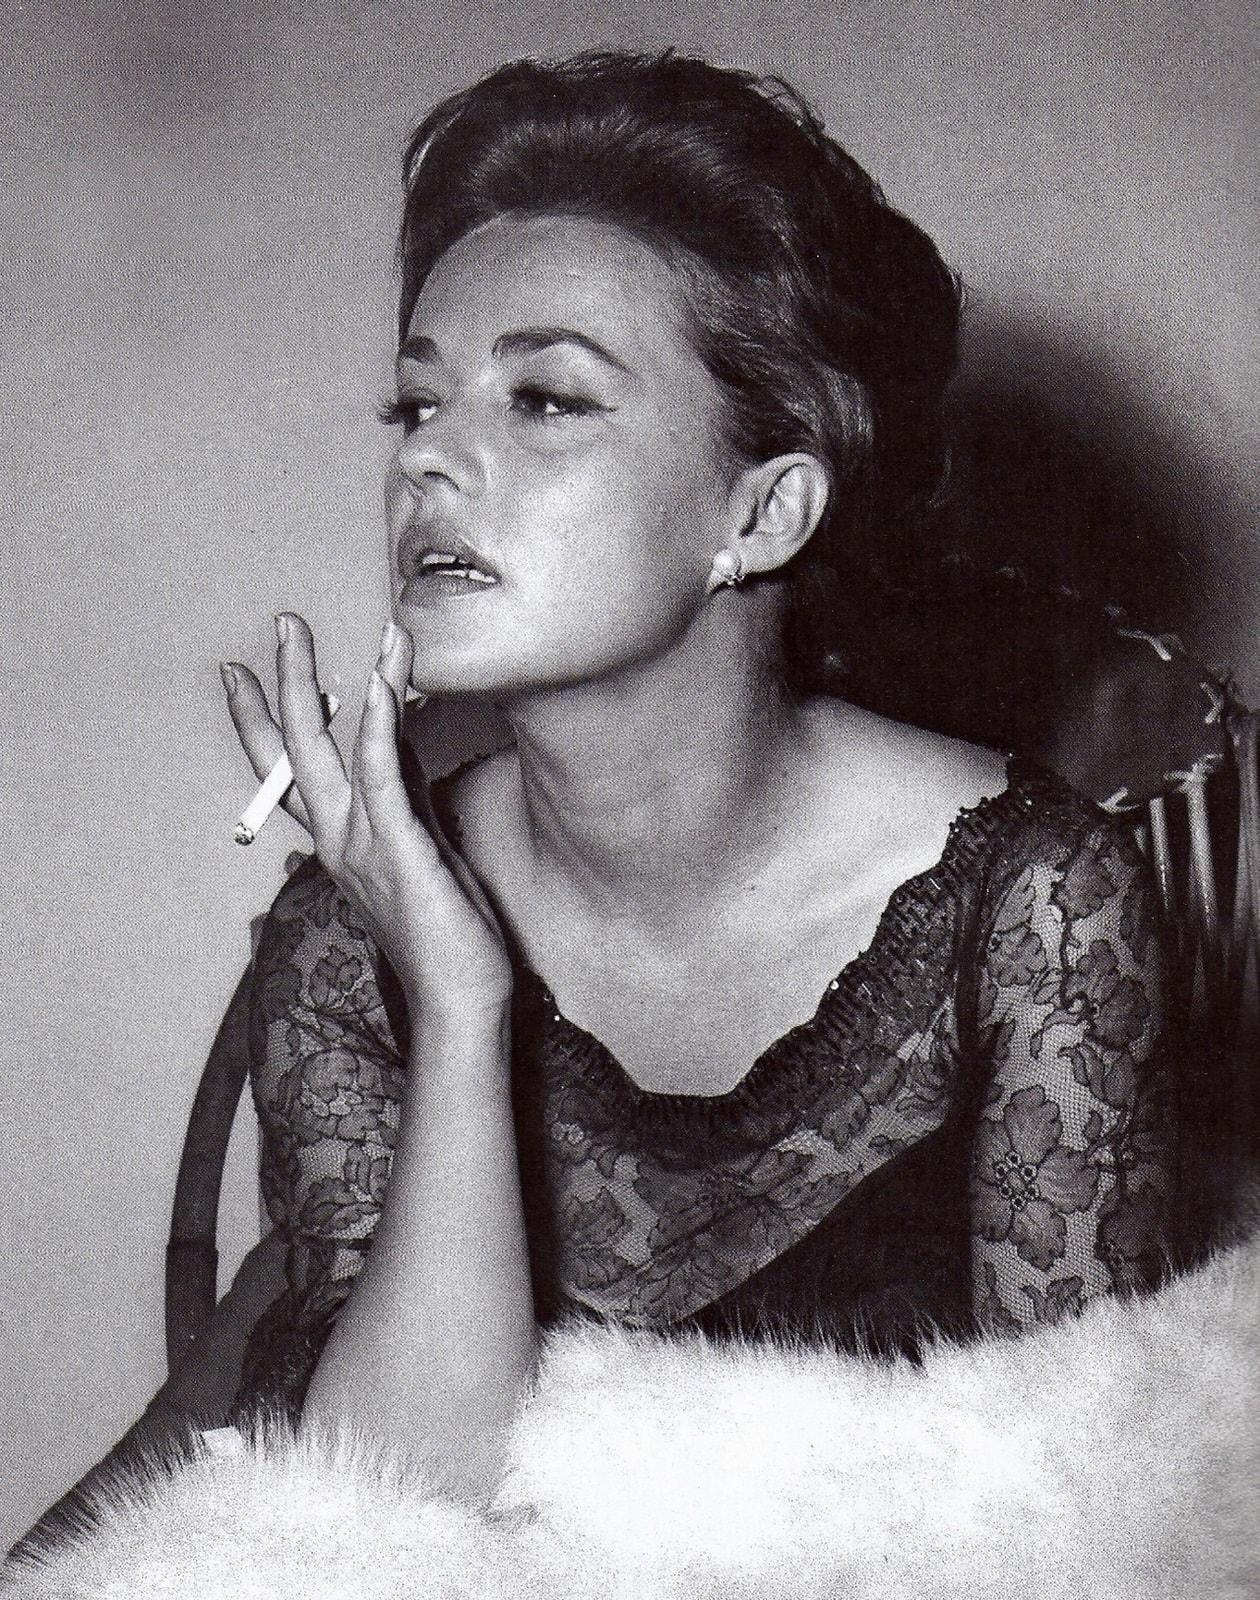 Jeanne Moreau Wallpapers